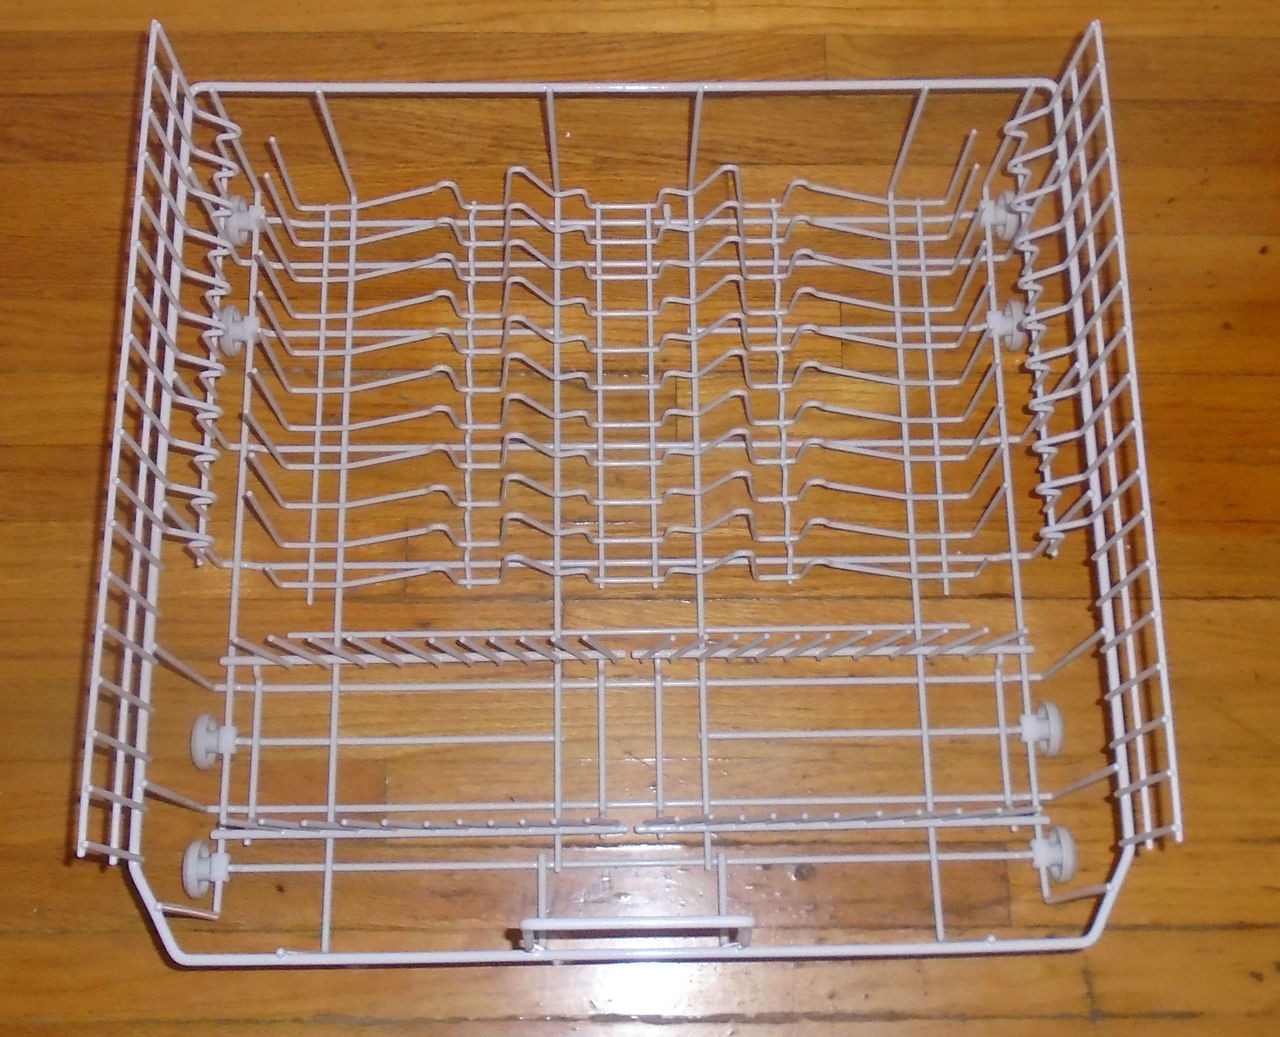 Miele Bottom Lower Dishrack Dishwasher Repair Parts